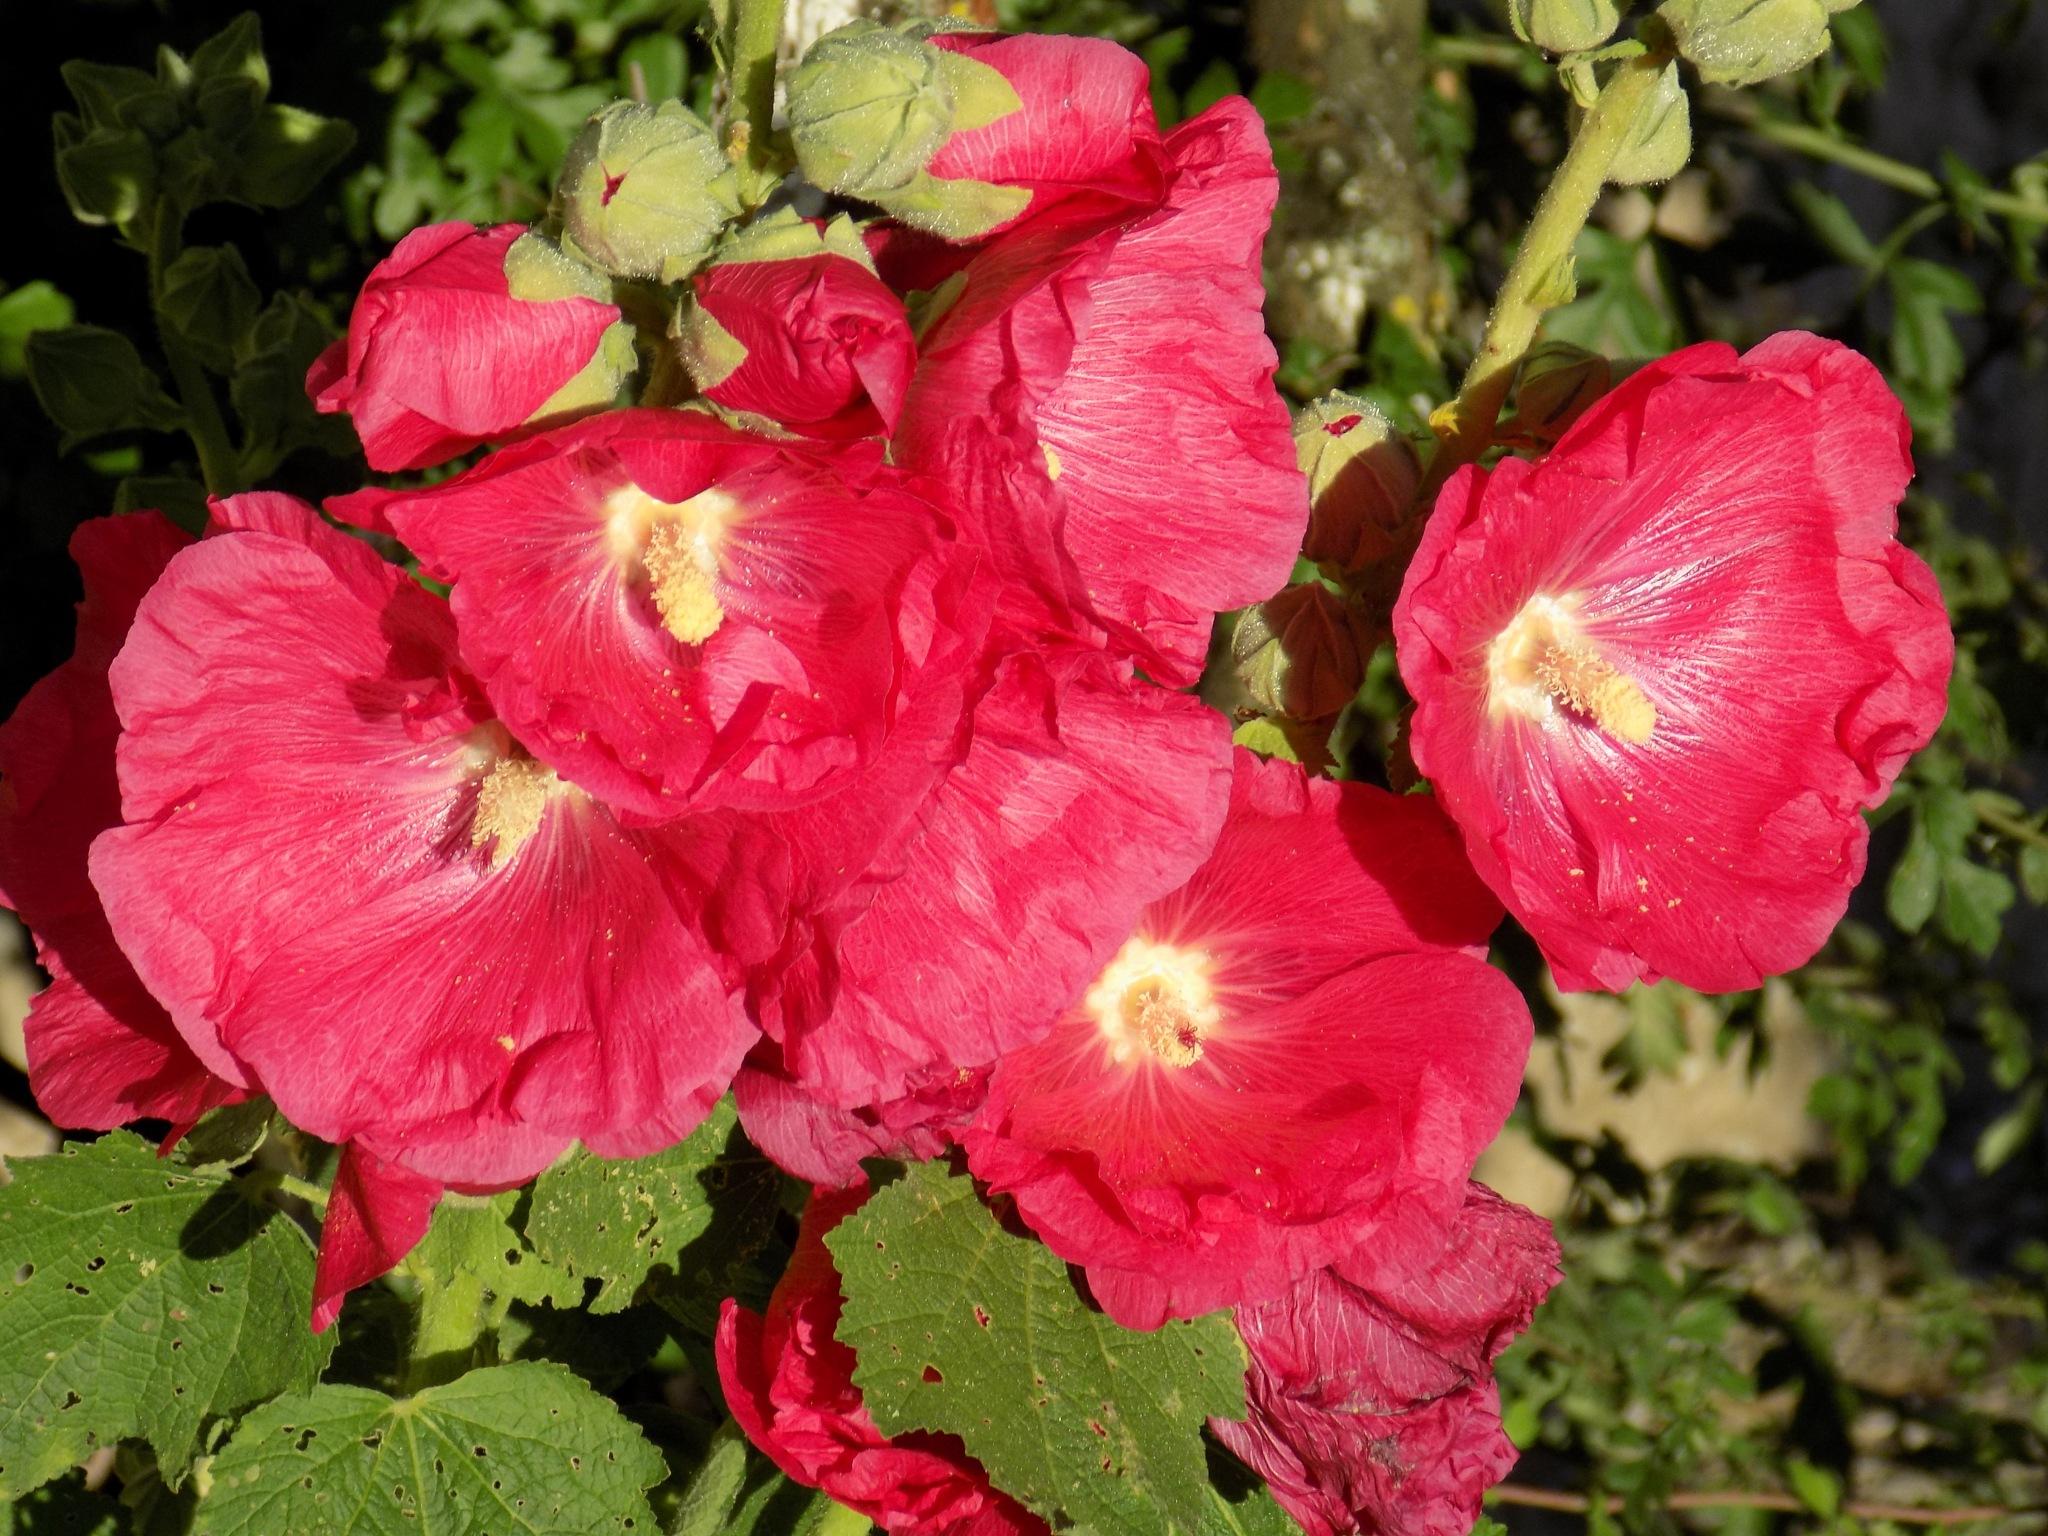 Red flowers by uzkuraitiene62